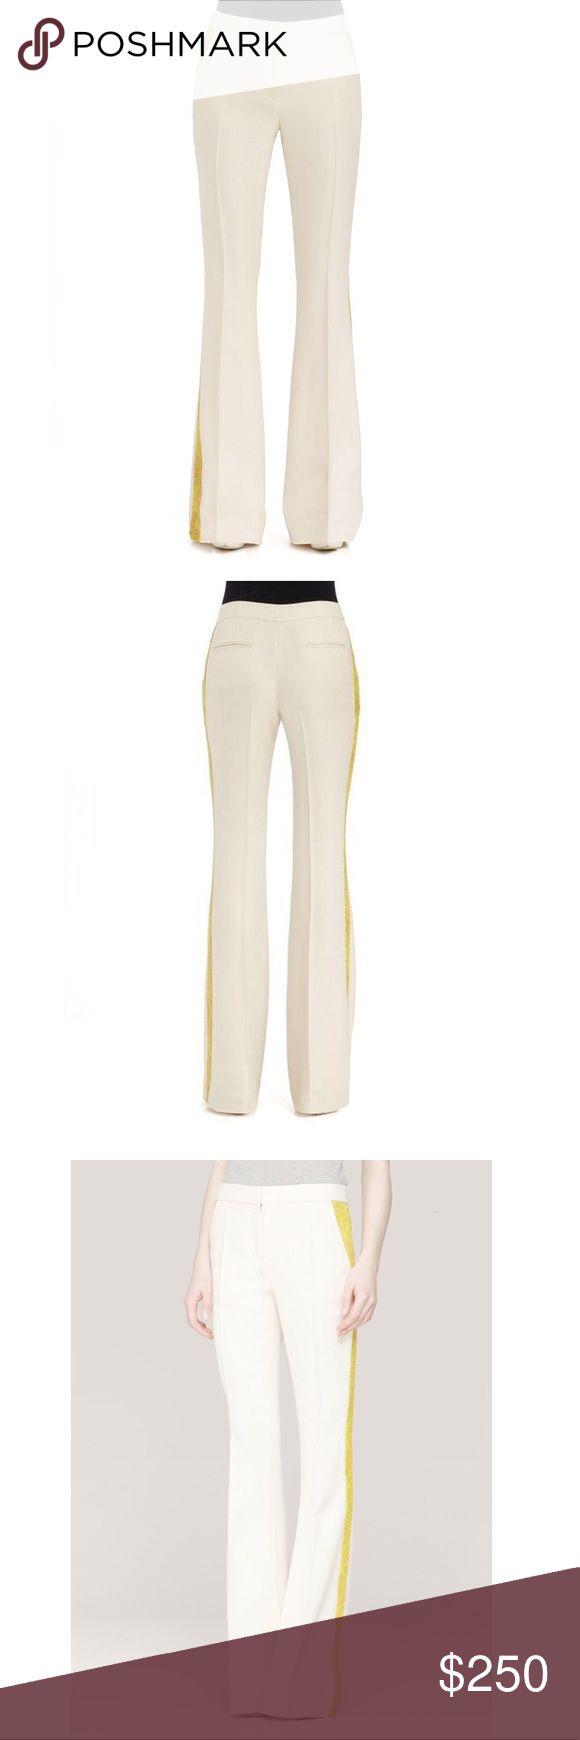 new stella maccartney wide leg pants new pants.never worn Stella McCartney Pants Boot Cut & Flare